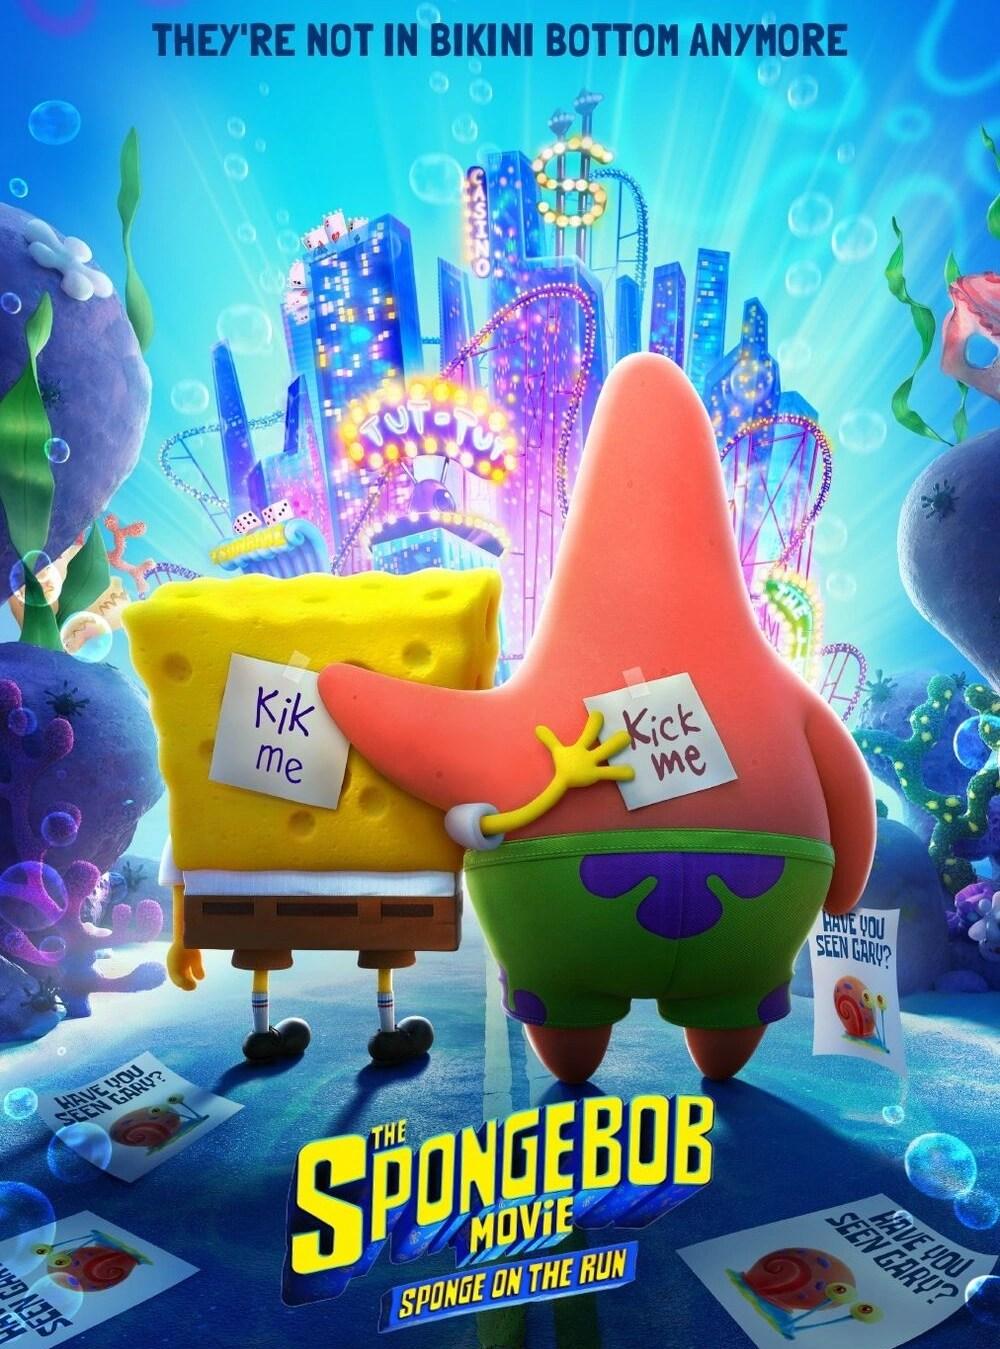 The Spongebob Movie It's A Wonderful Sponge : spongebob, movie, wonderful, sponge, SpongeBob, Movie:, Sponge, Encyclopedia, SpongeBobia, Fandom